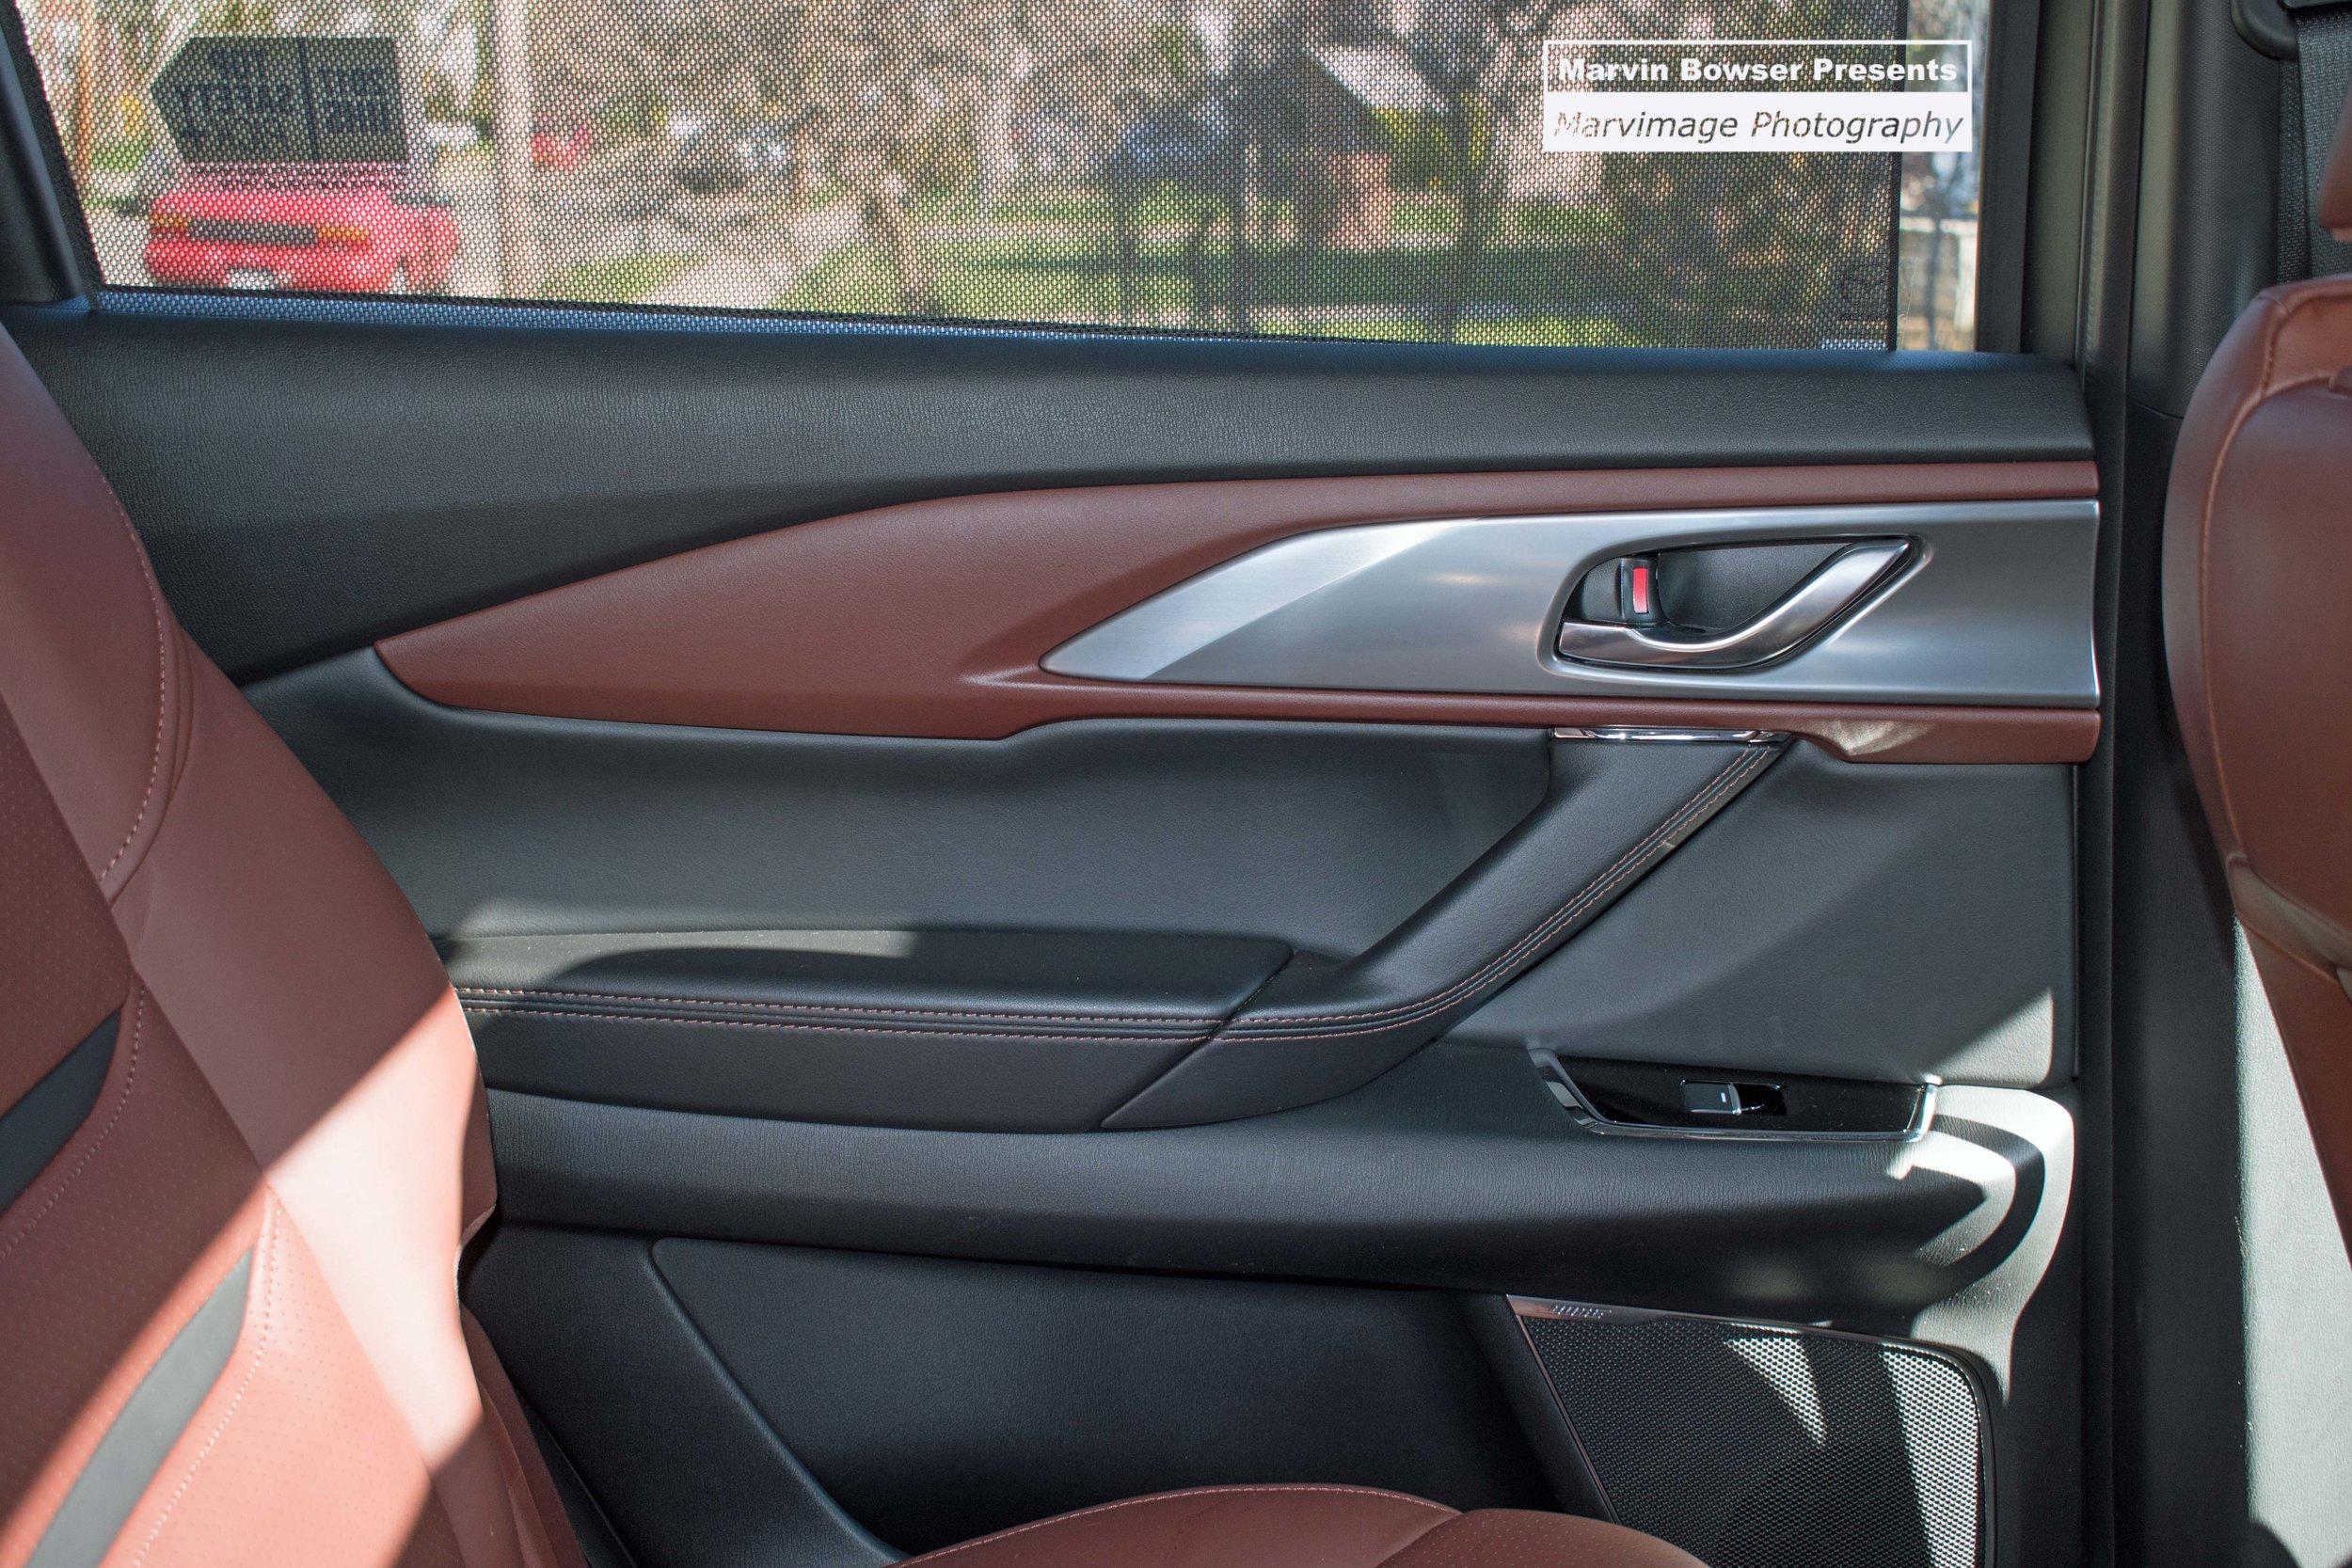 Passenger Door, privacy glass, sun shade